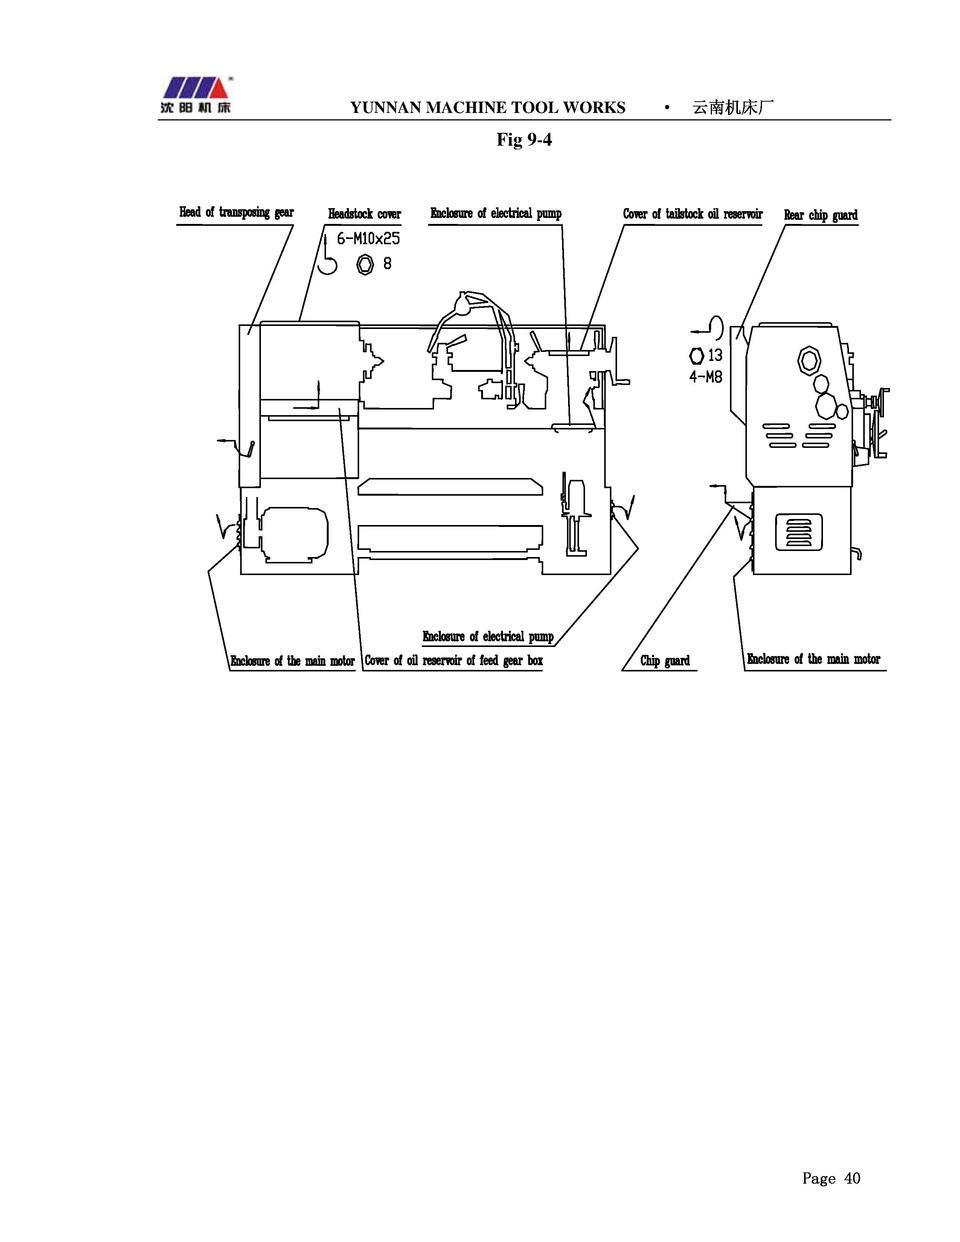 hight resolution of yunnan machine tool works